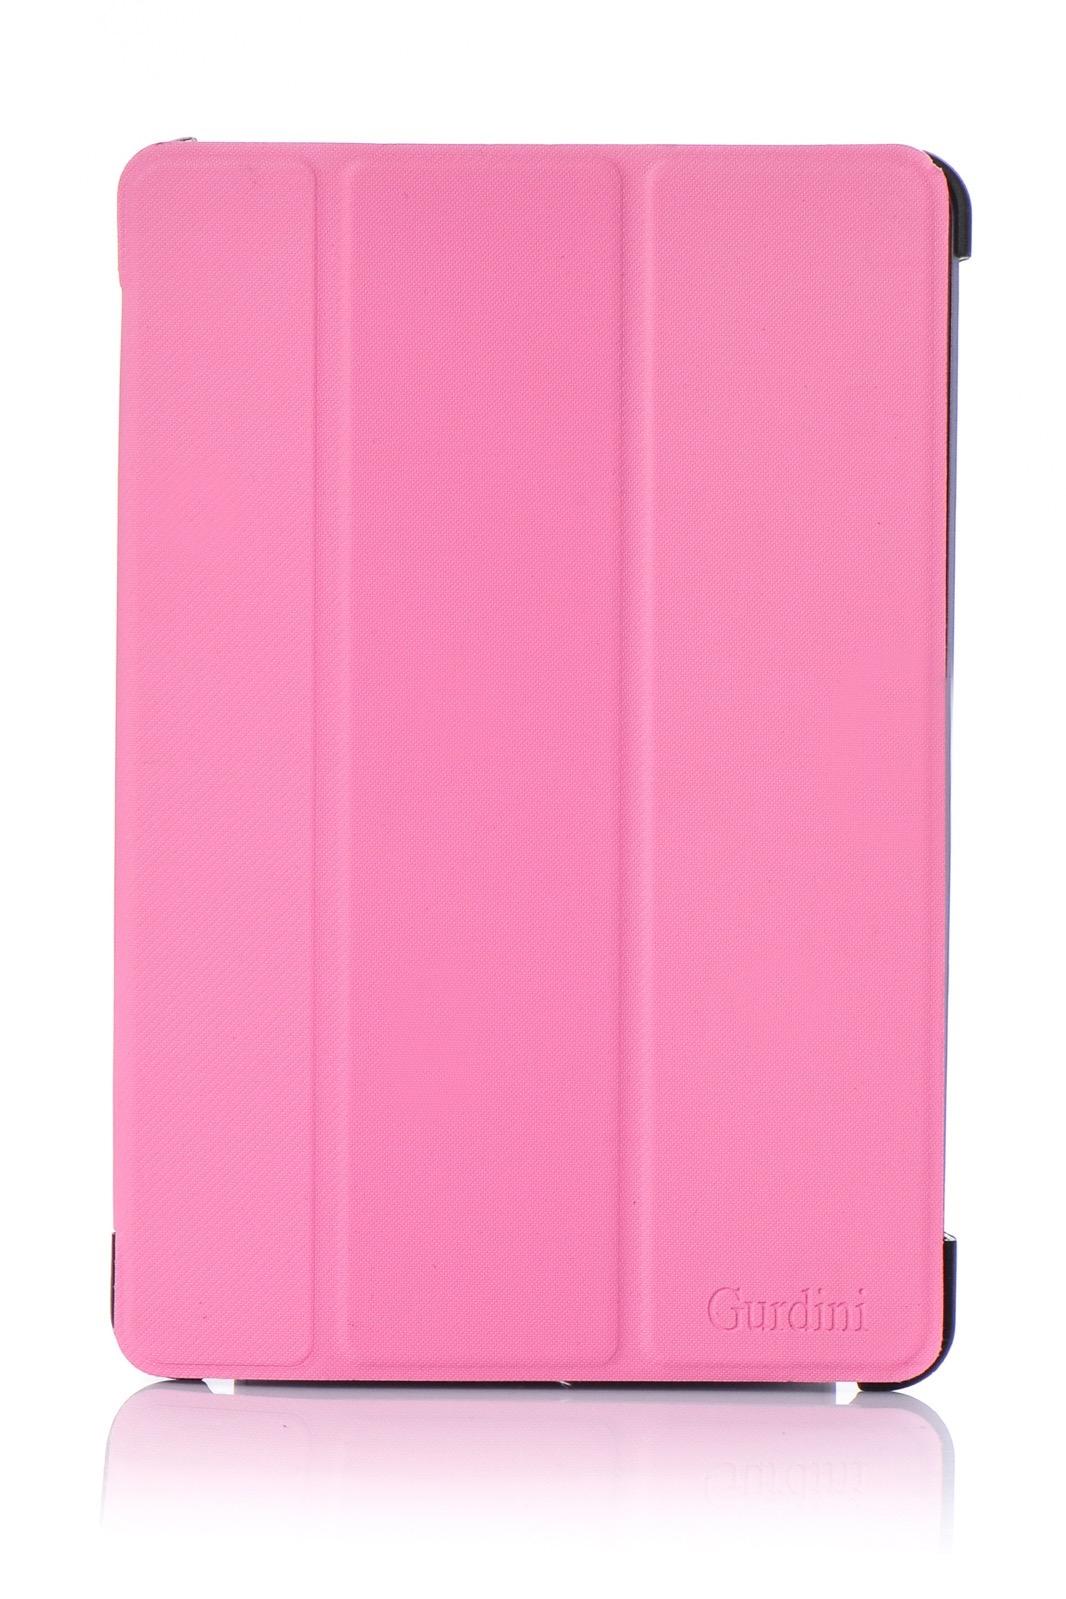 "Чехол для планшета Gurdini книжка с магнитом 410046 для Apple iPad mini 7.9"", розовый"